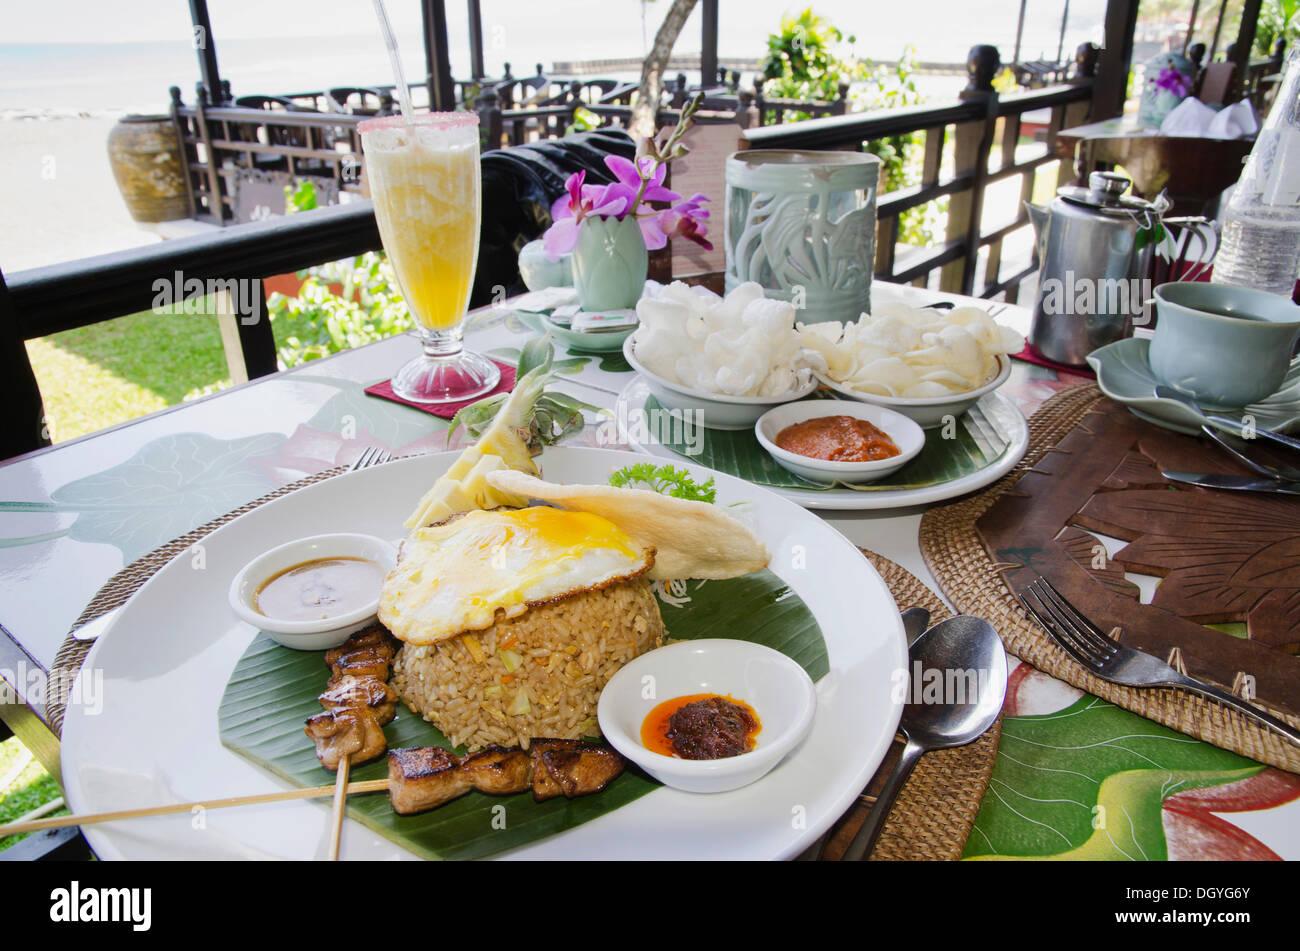 nasi goreng, indonesian fried rice, indonesian cuisine, at a stock